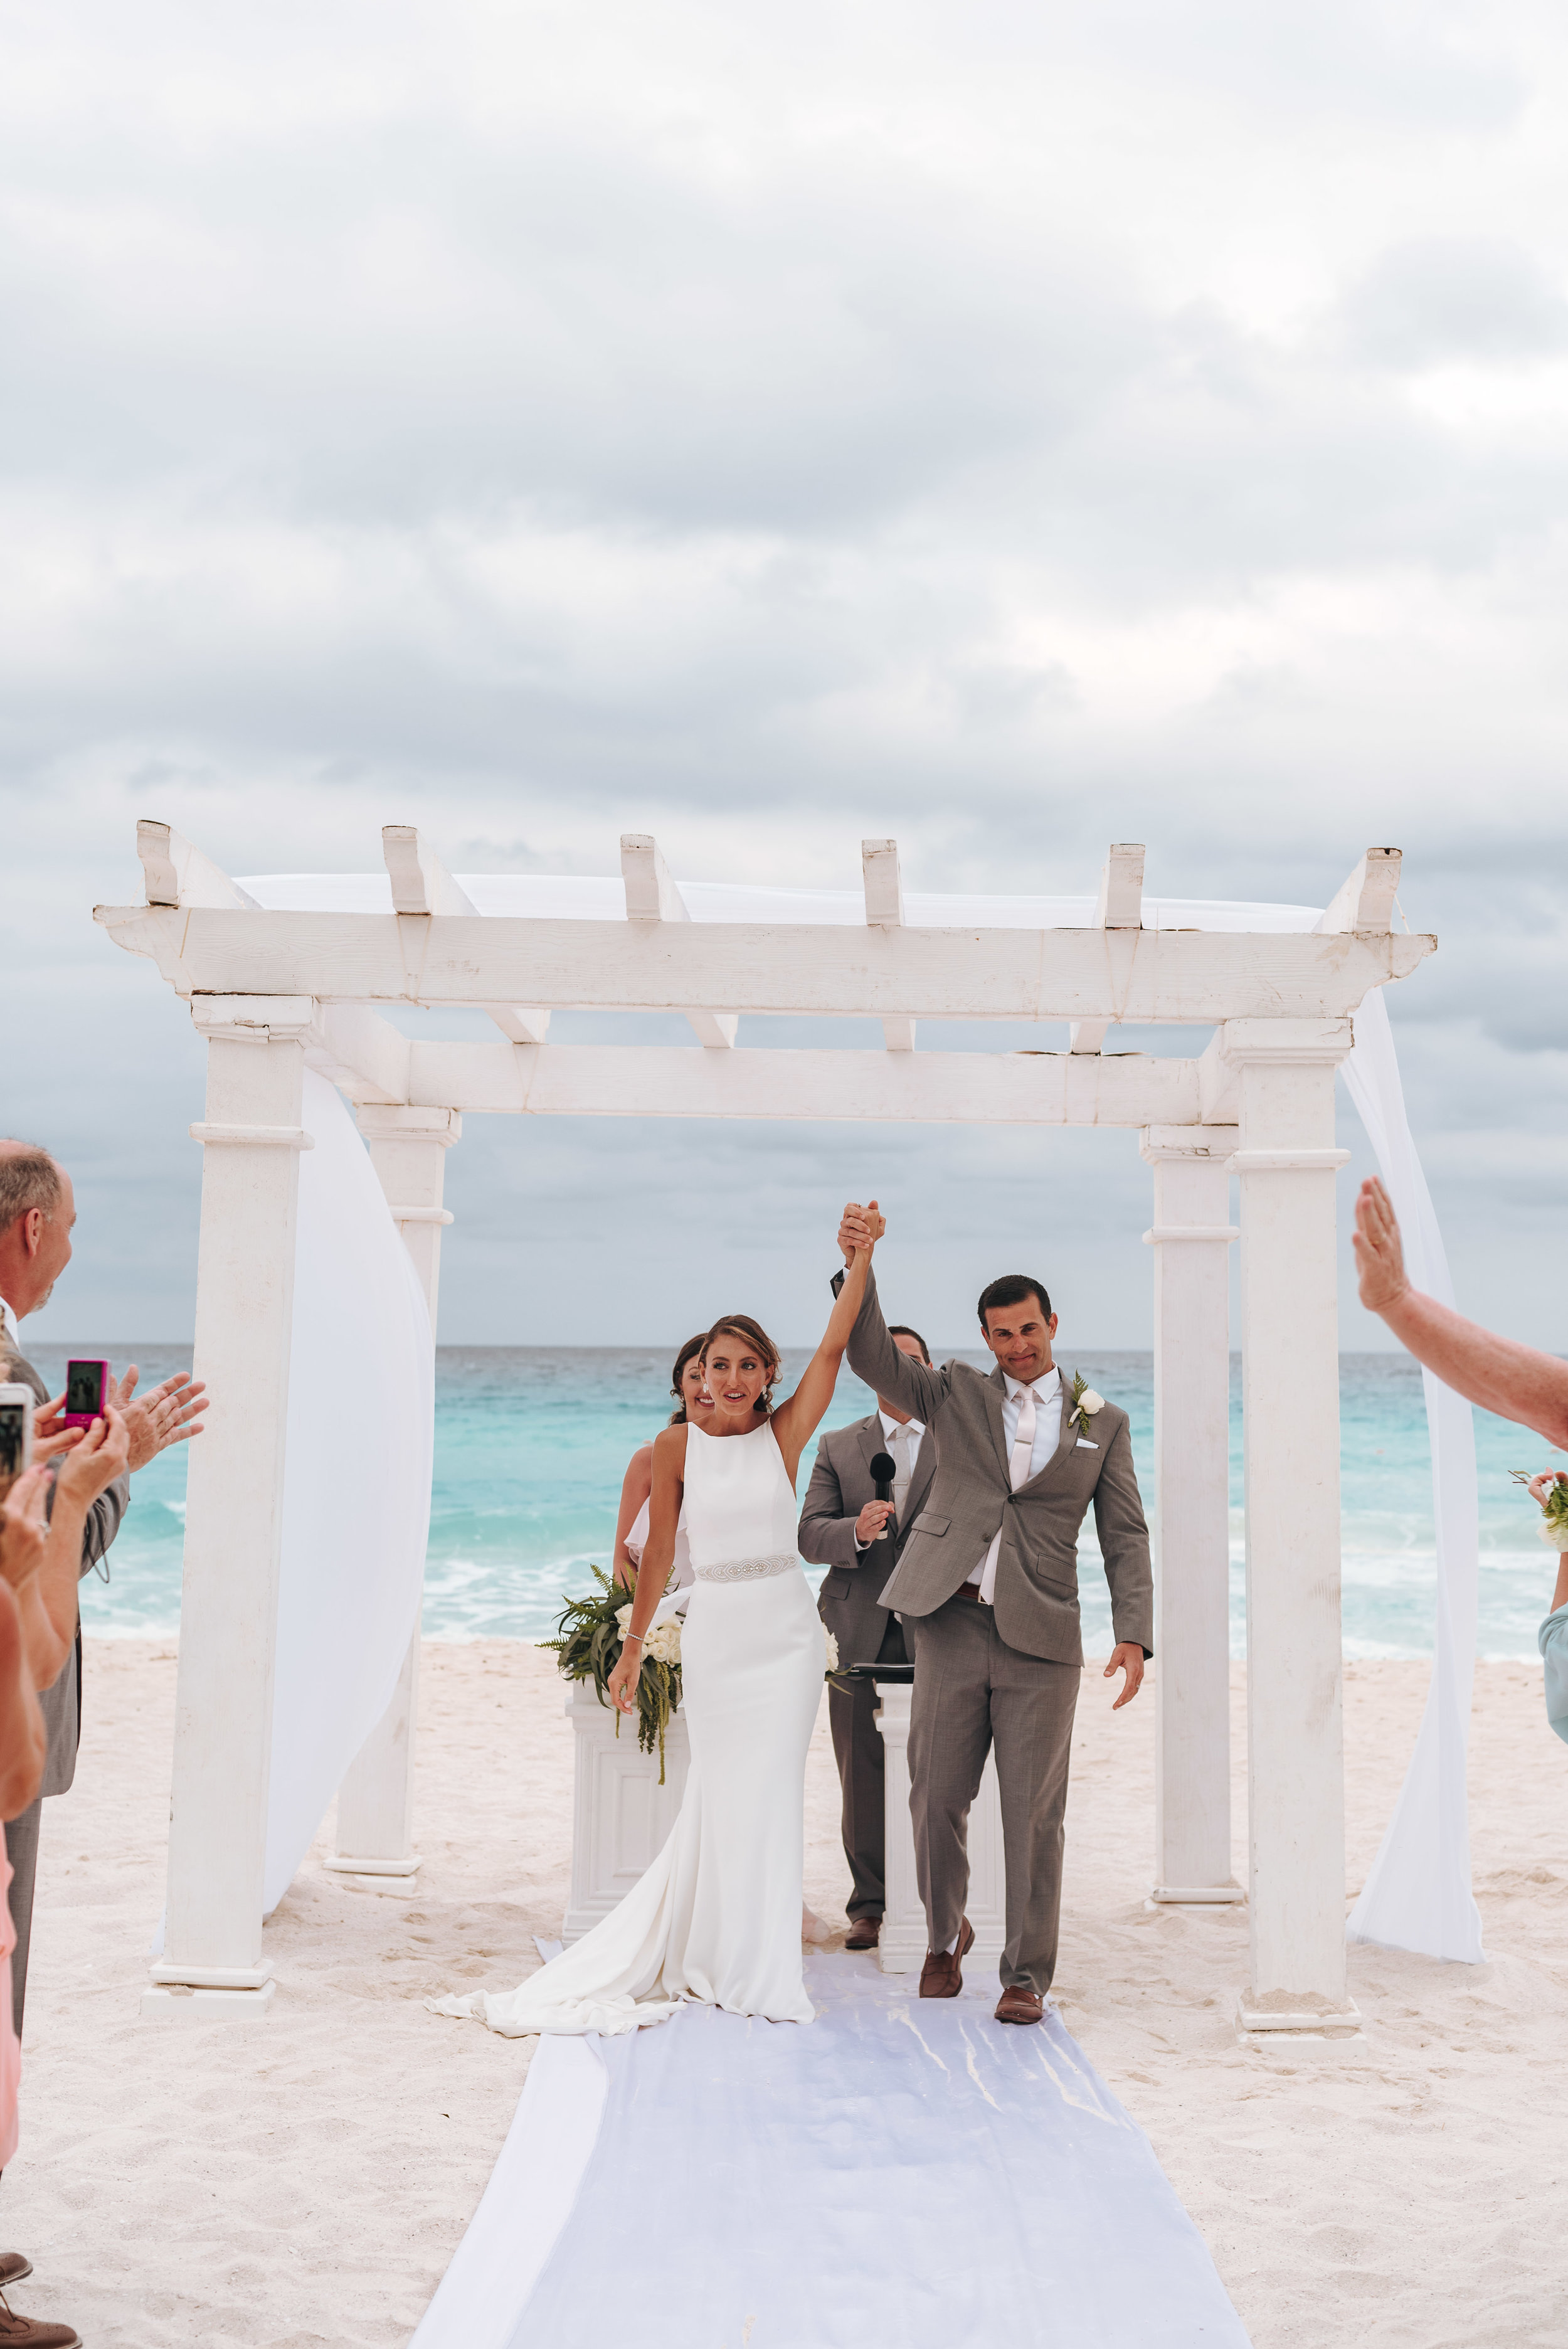 mexico_destination_wedding_ceremony-5.jpg